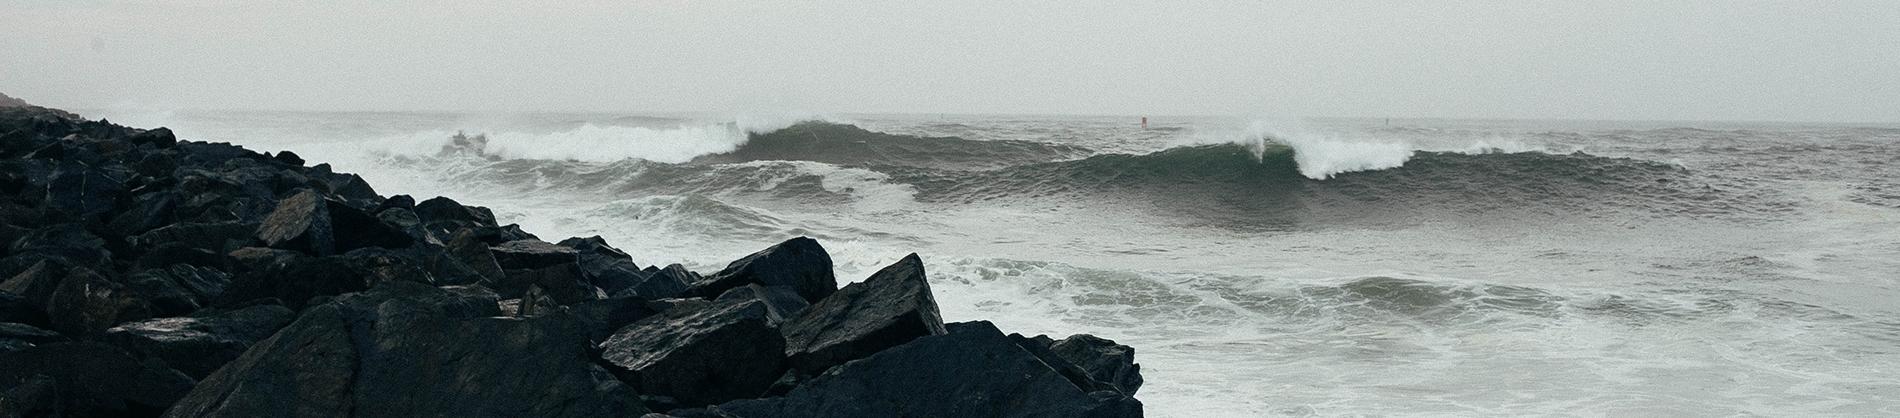 A stormy sea hitting rocks